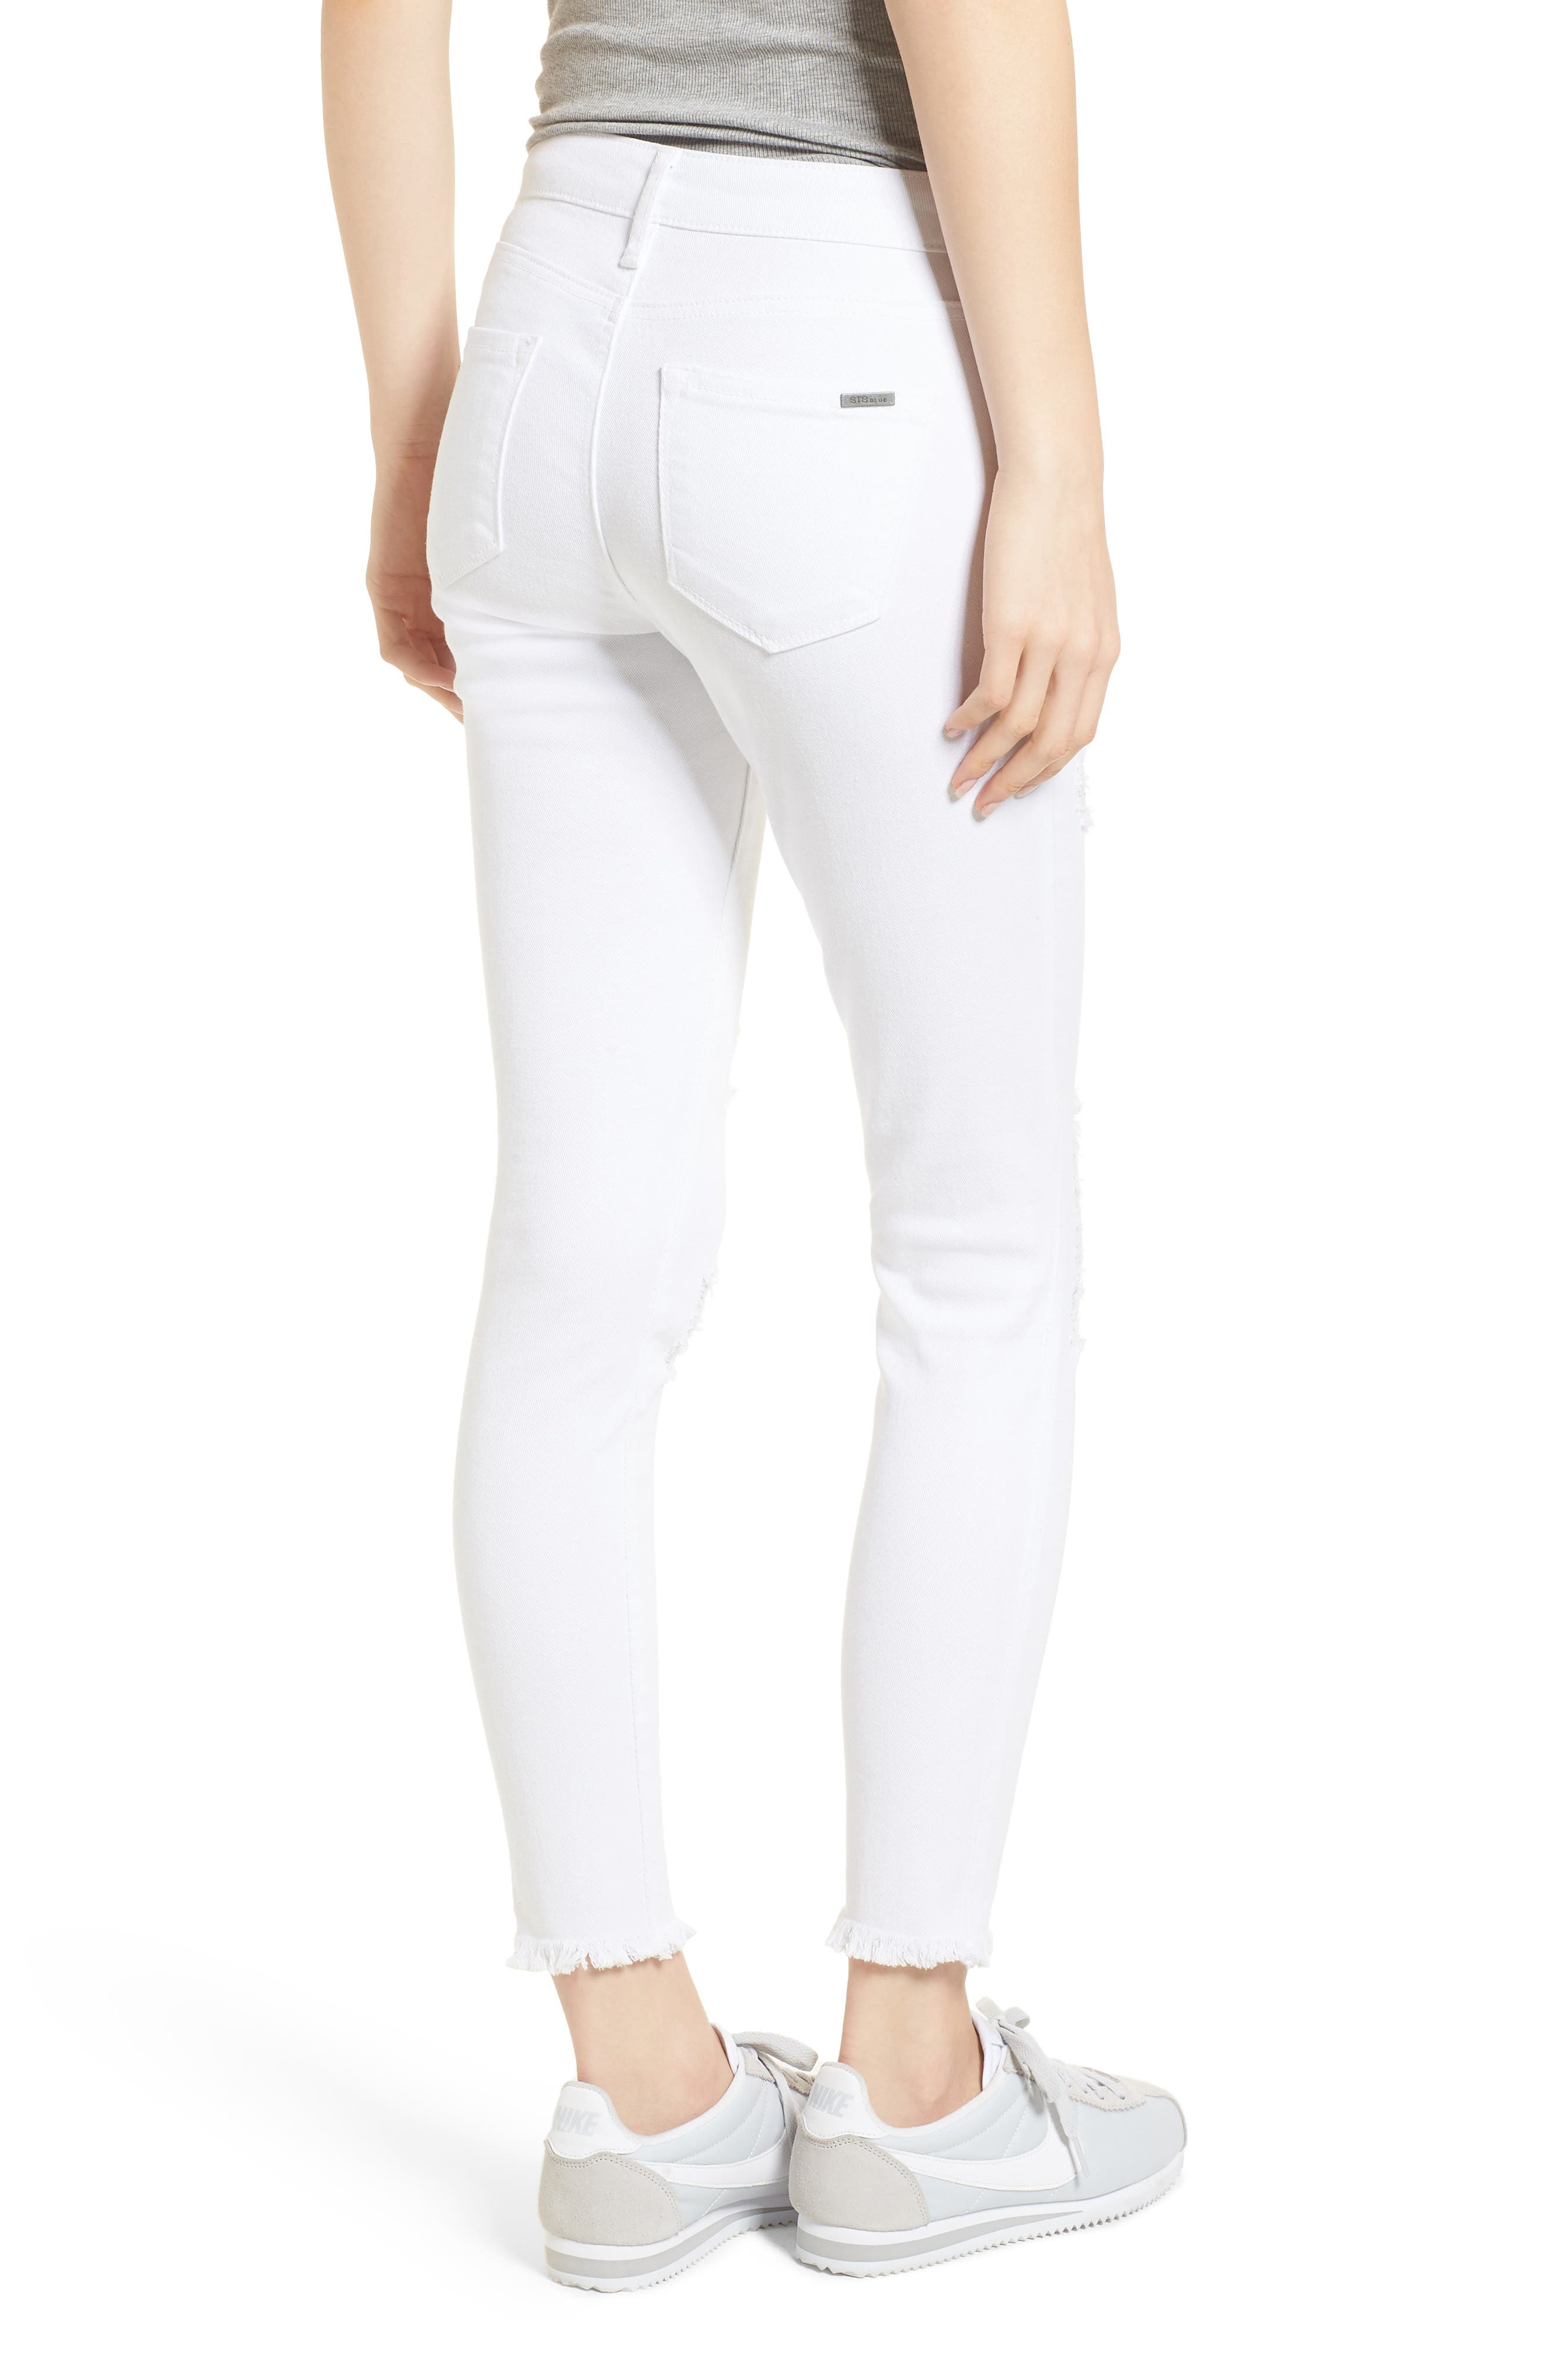 Emma Distressed Skinny Jeans,                             Alternate thumbnail 2, color,                             Optic White